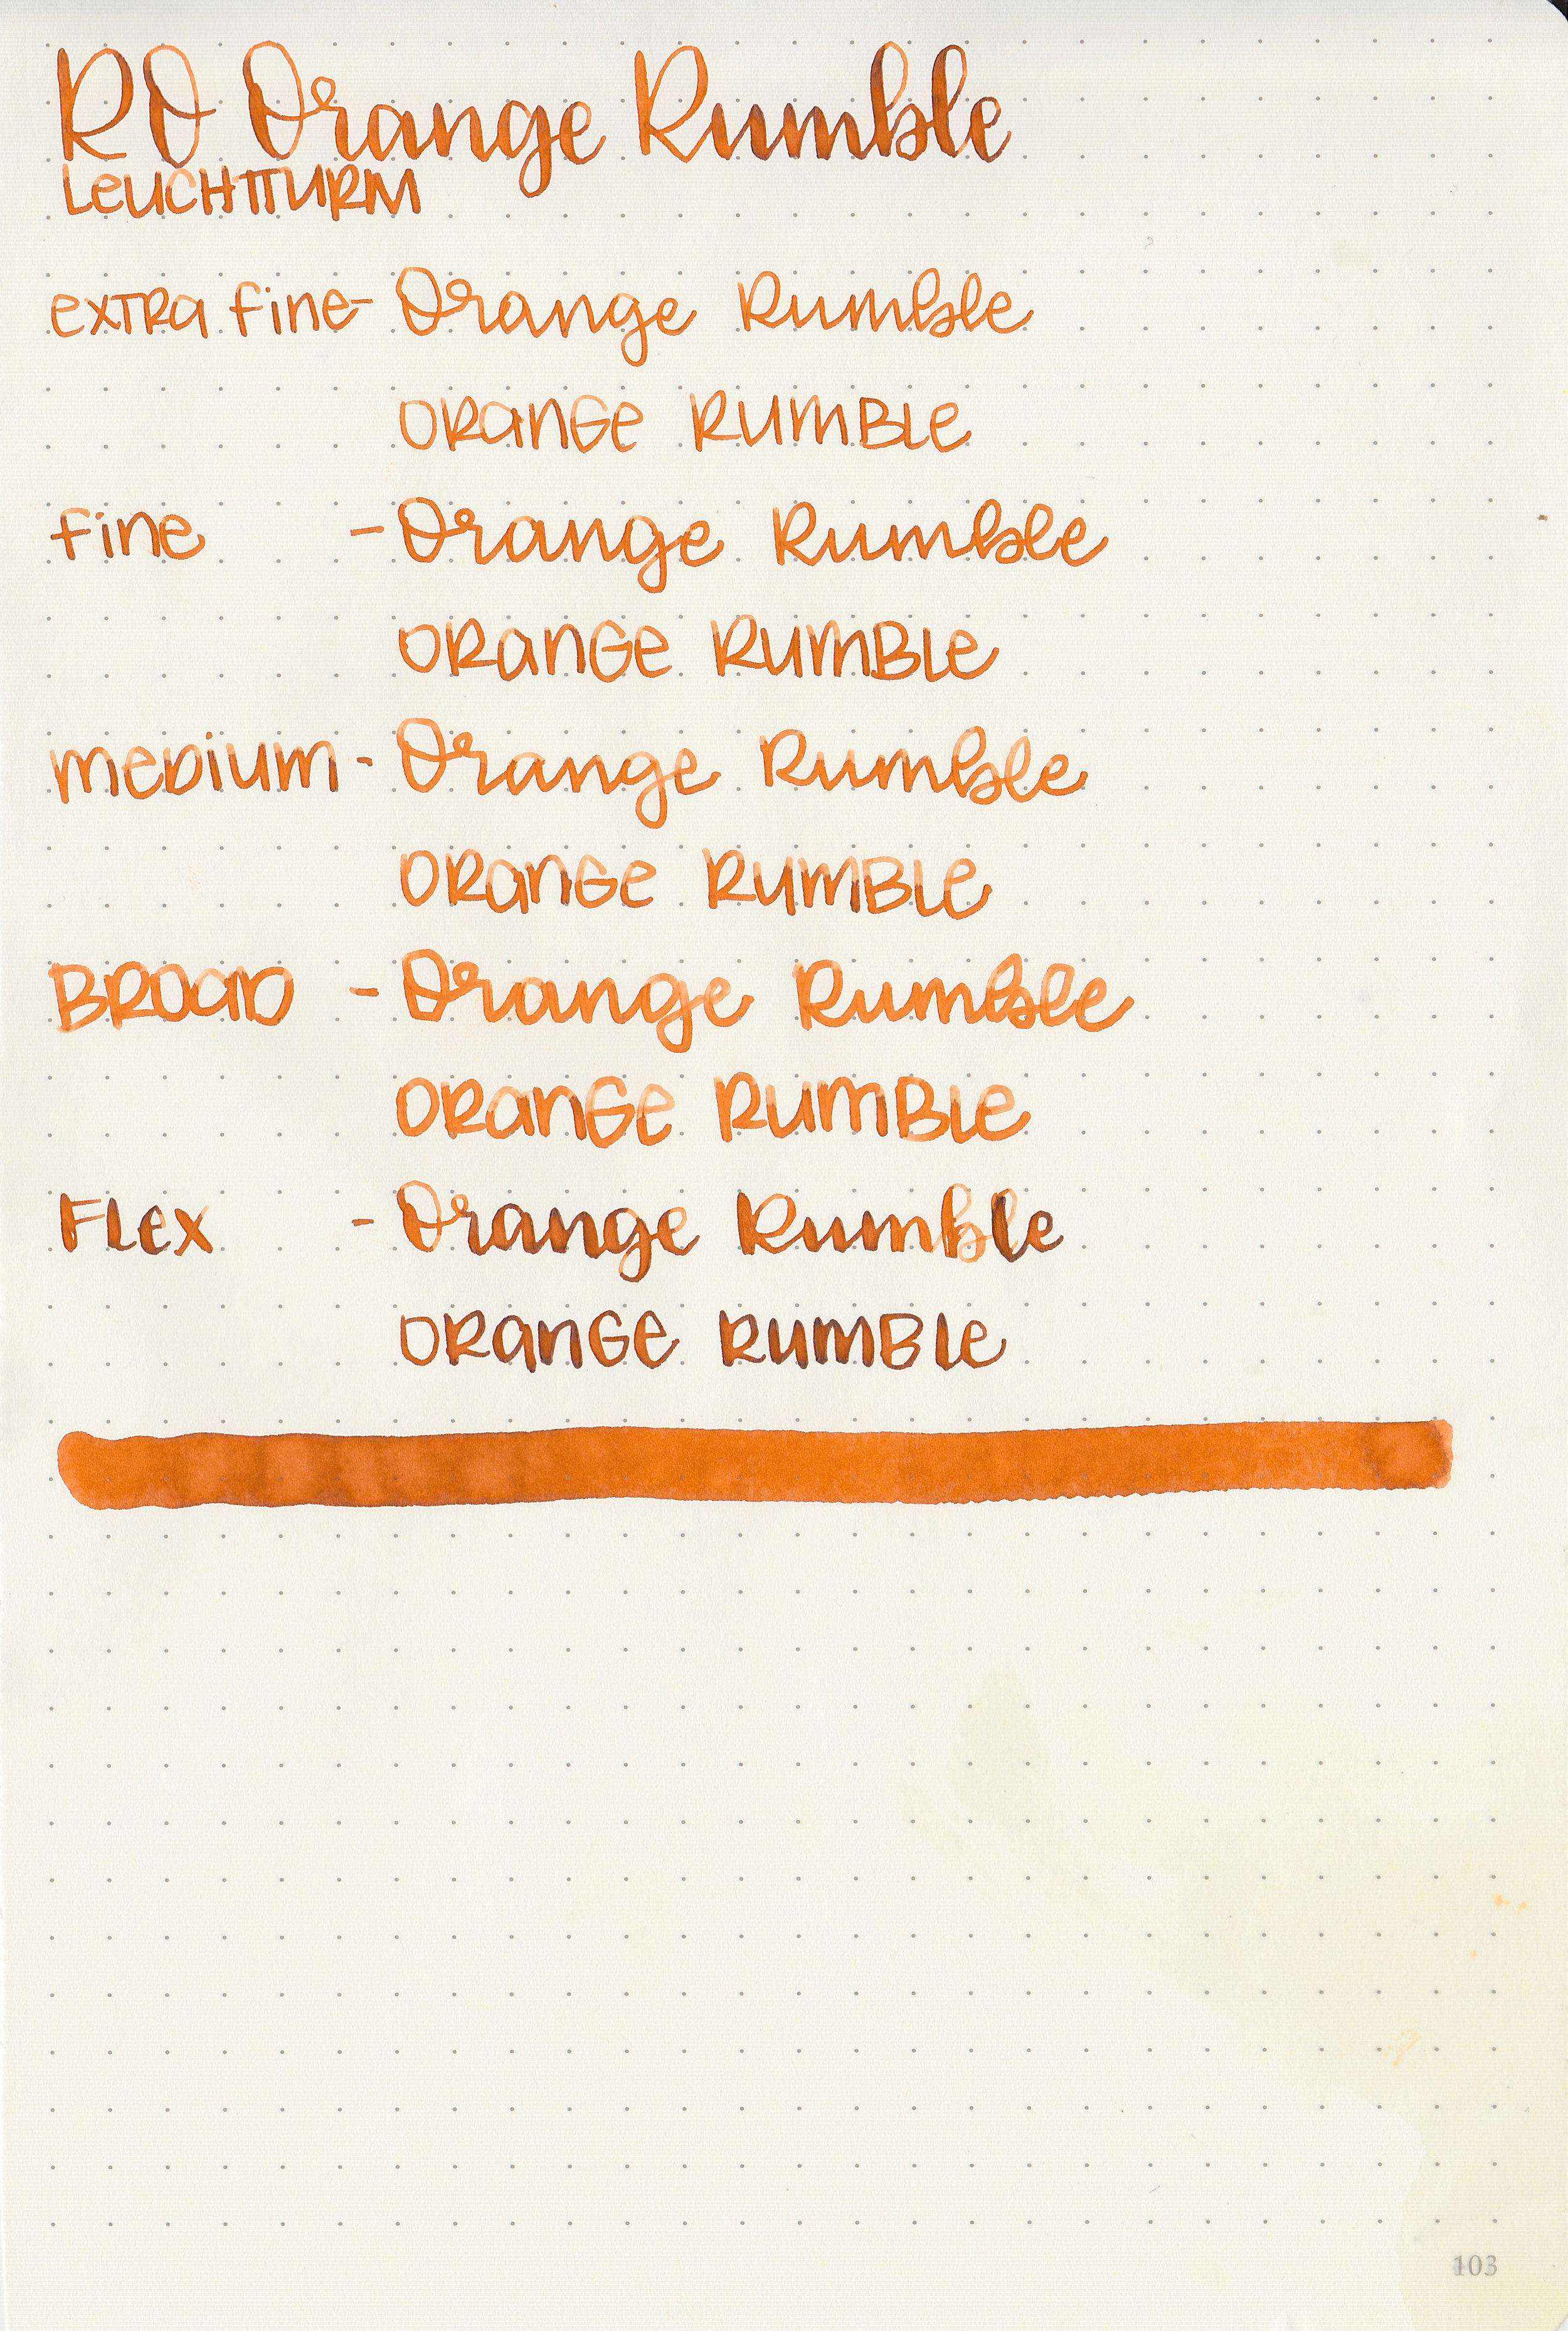 ro-orange-rumble-9.jpg